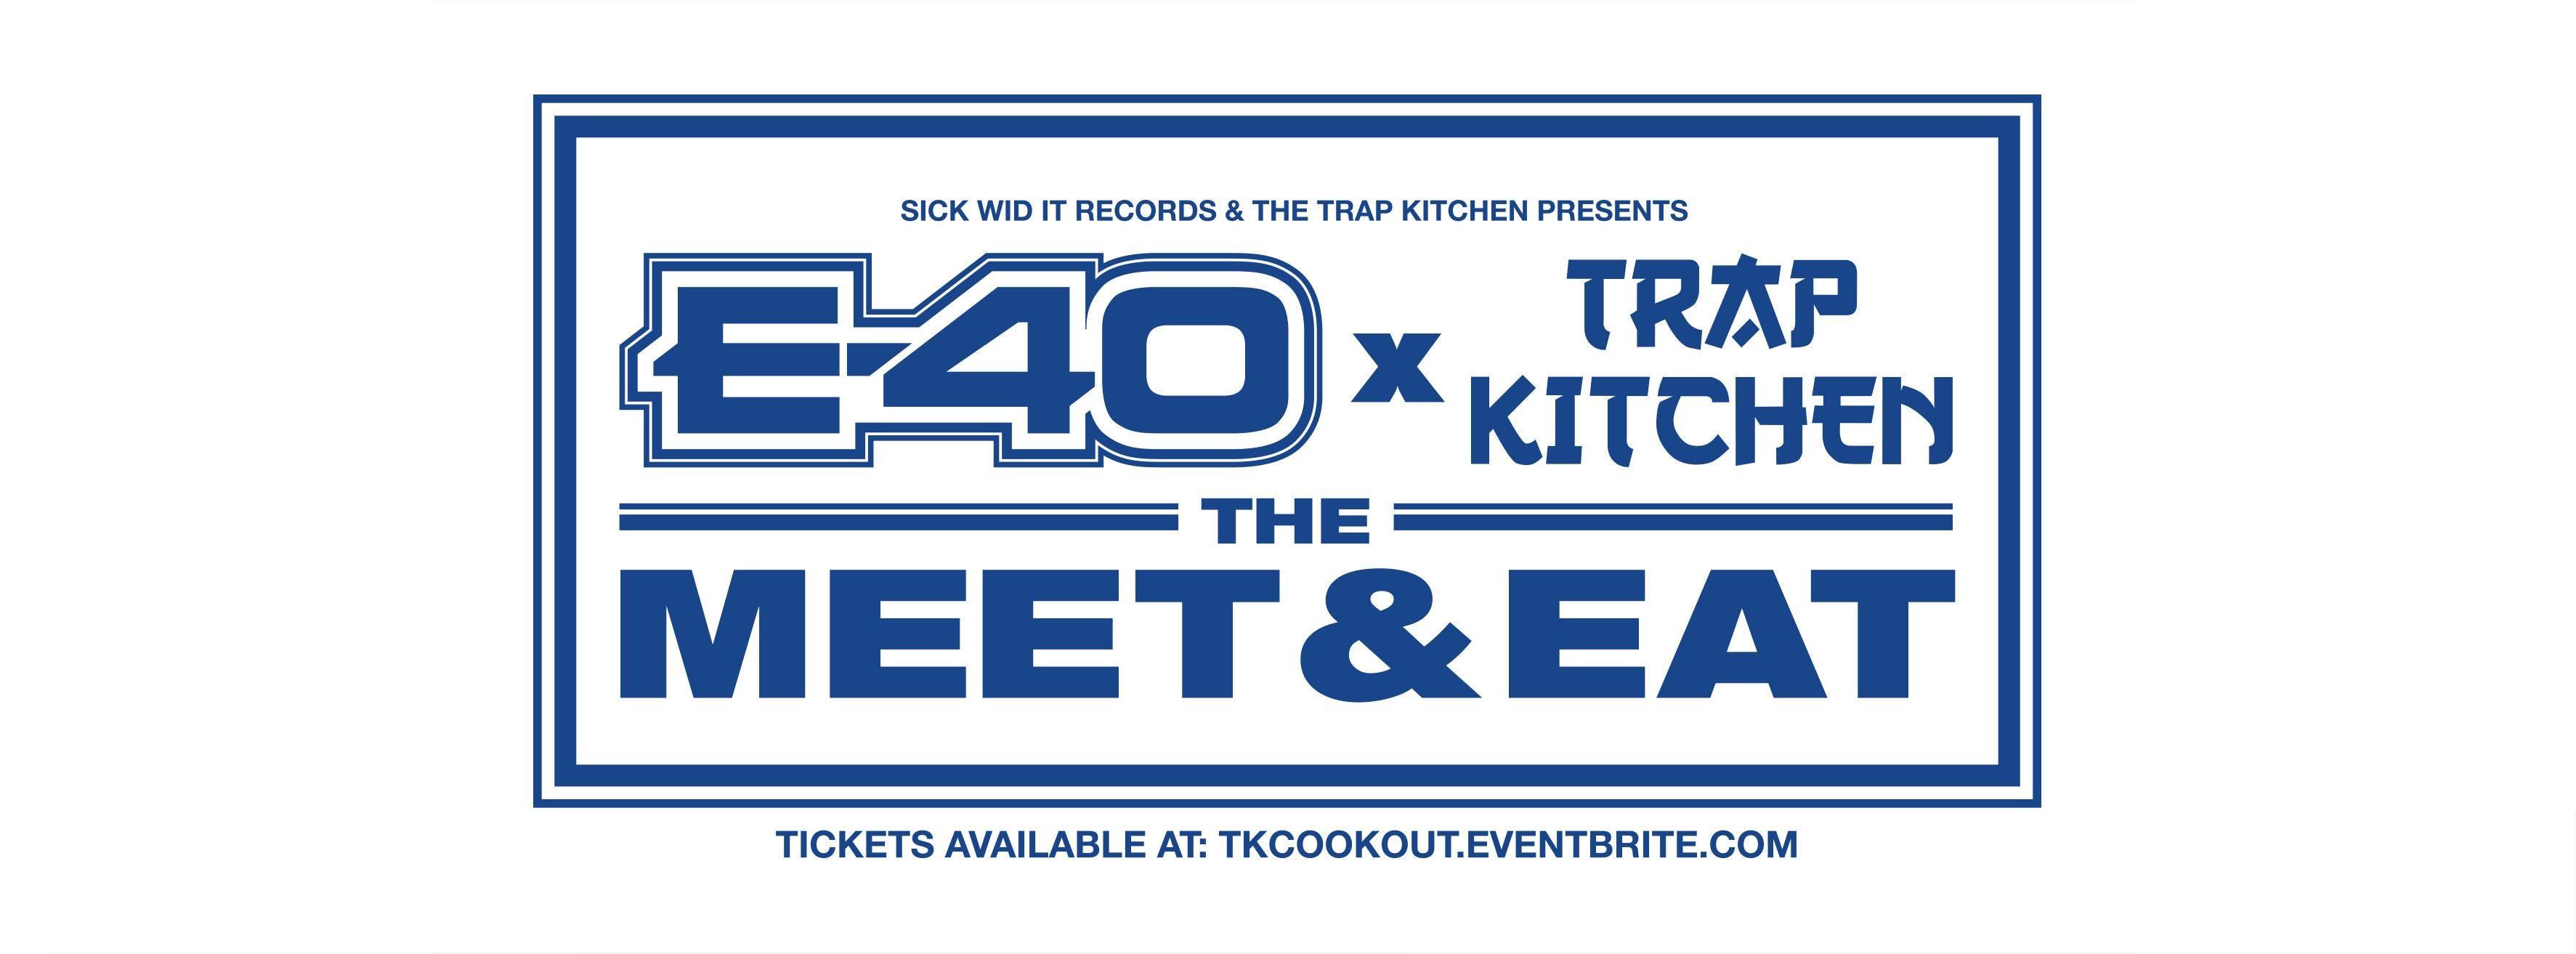 E-40 x Trap Kitchen `Meet & Eat` - Denver - 15 SEP 2018